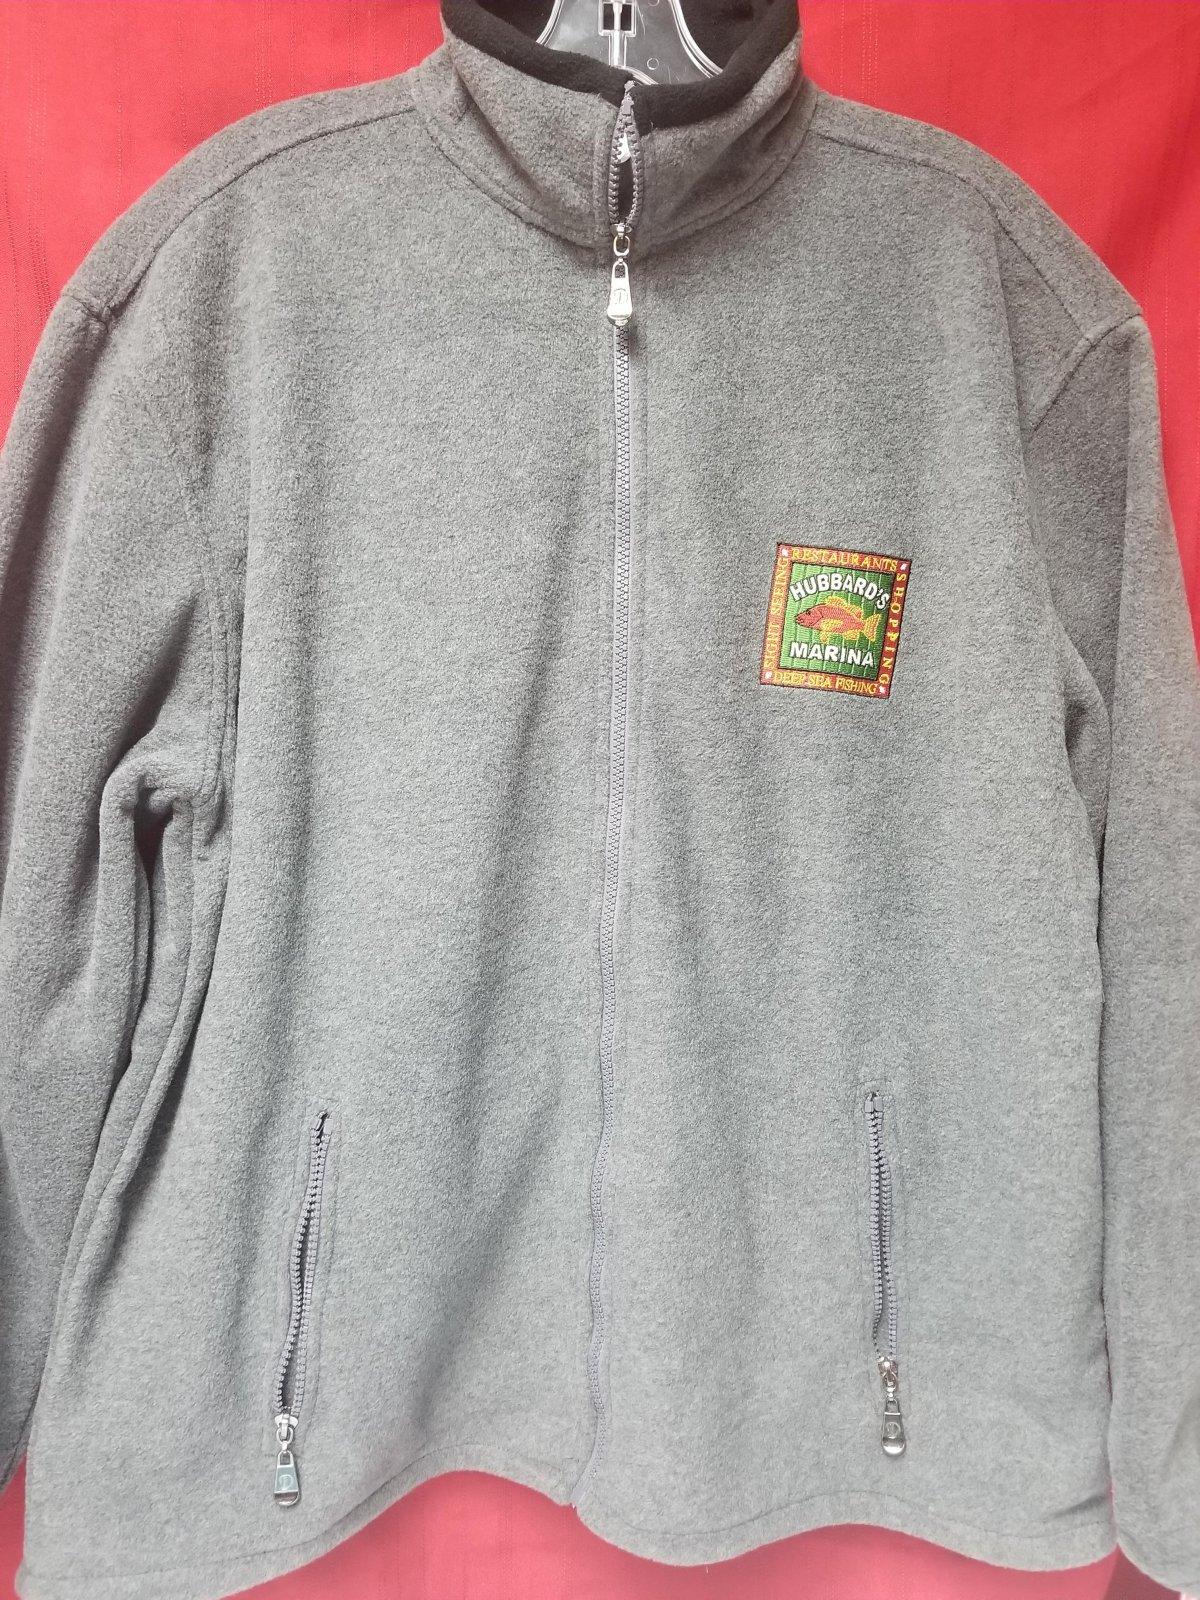 Hubbard's Zipper Fleece Jacket